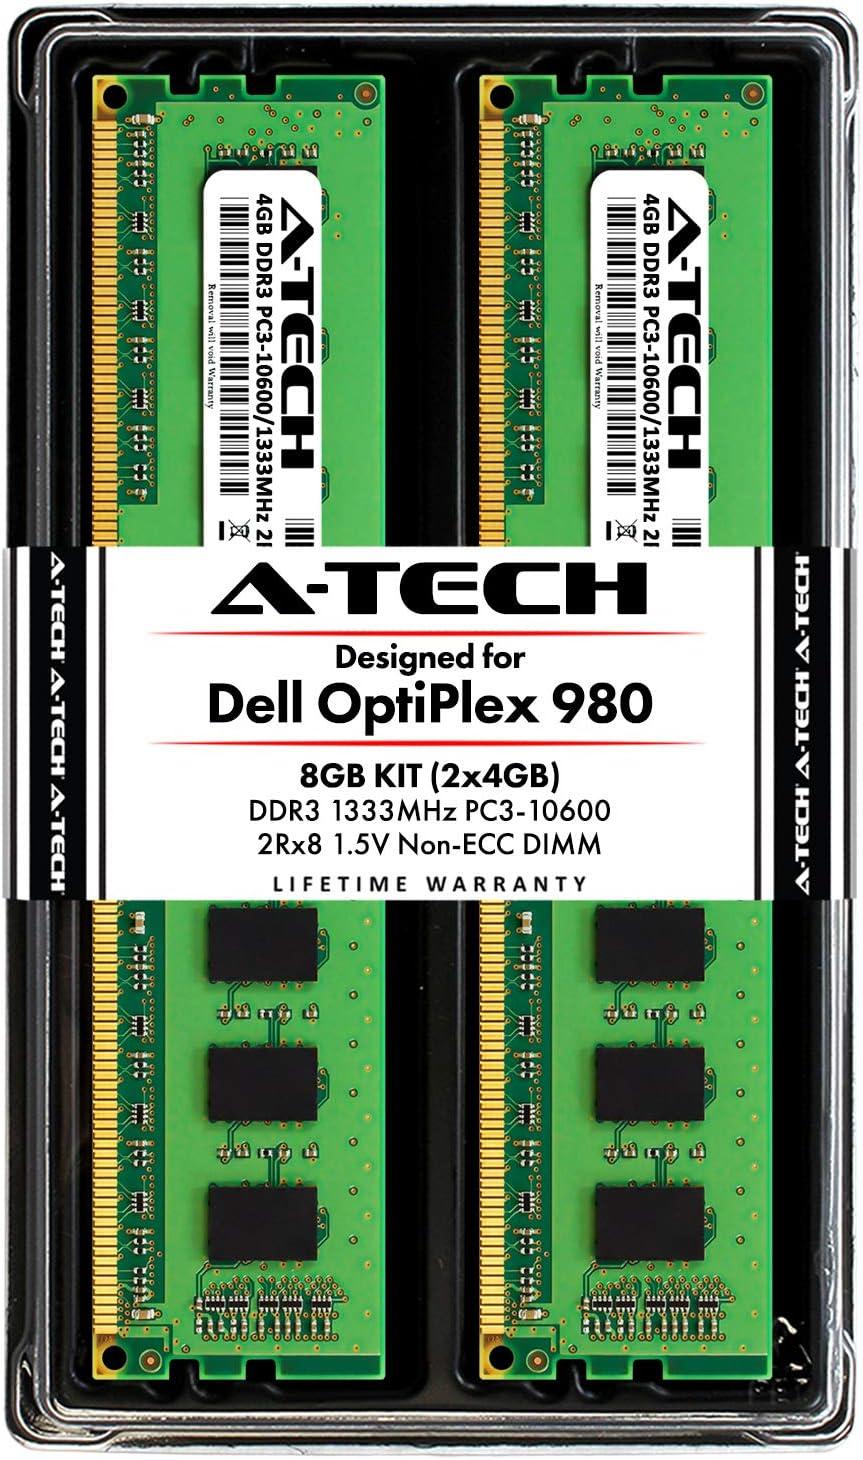 A-Tech 8GB Kit (2 x 4GB) RAM for Dell OptiPlex 980 (MT, DT, SFF) - DDR3 1333MHz PC3-10600 Non-ECC DIMM Memory Modules